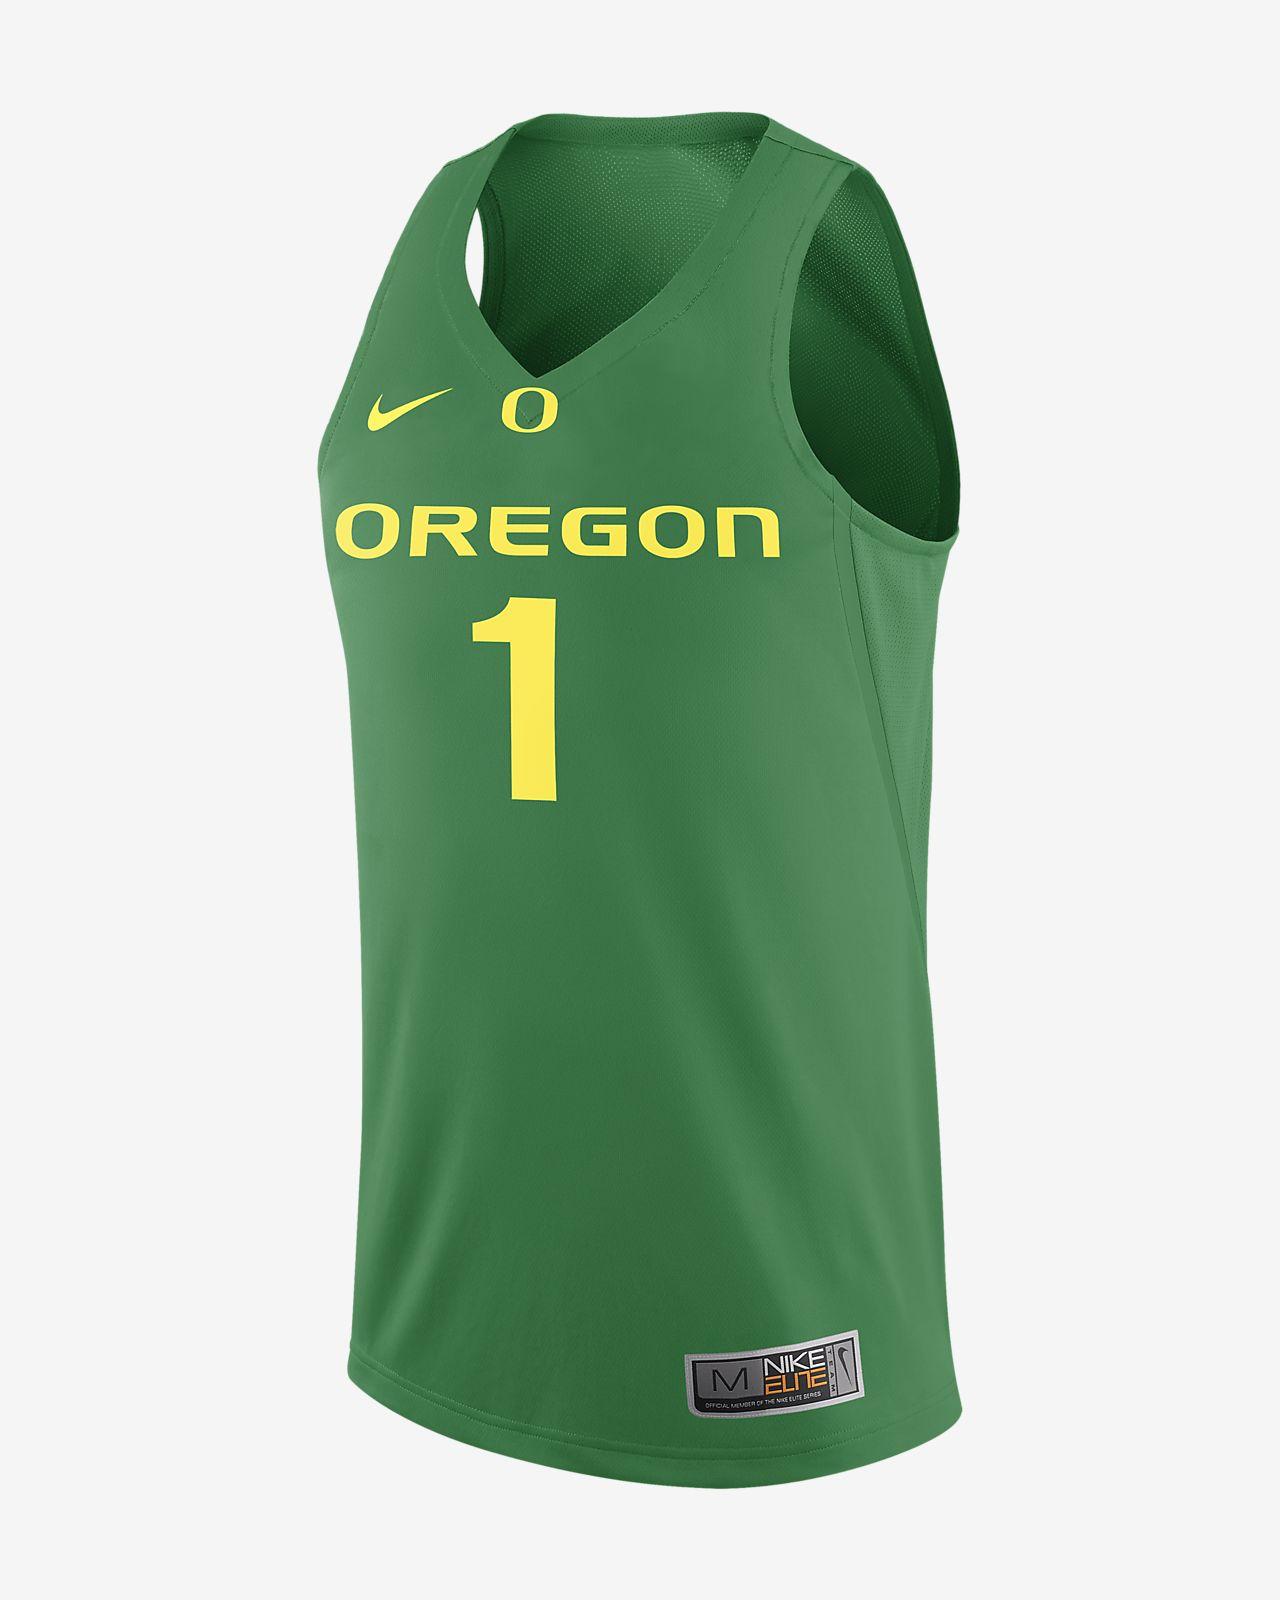 timeless design ae242 e20c1 Nike College Basketball Shirts